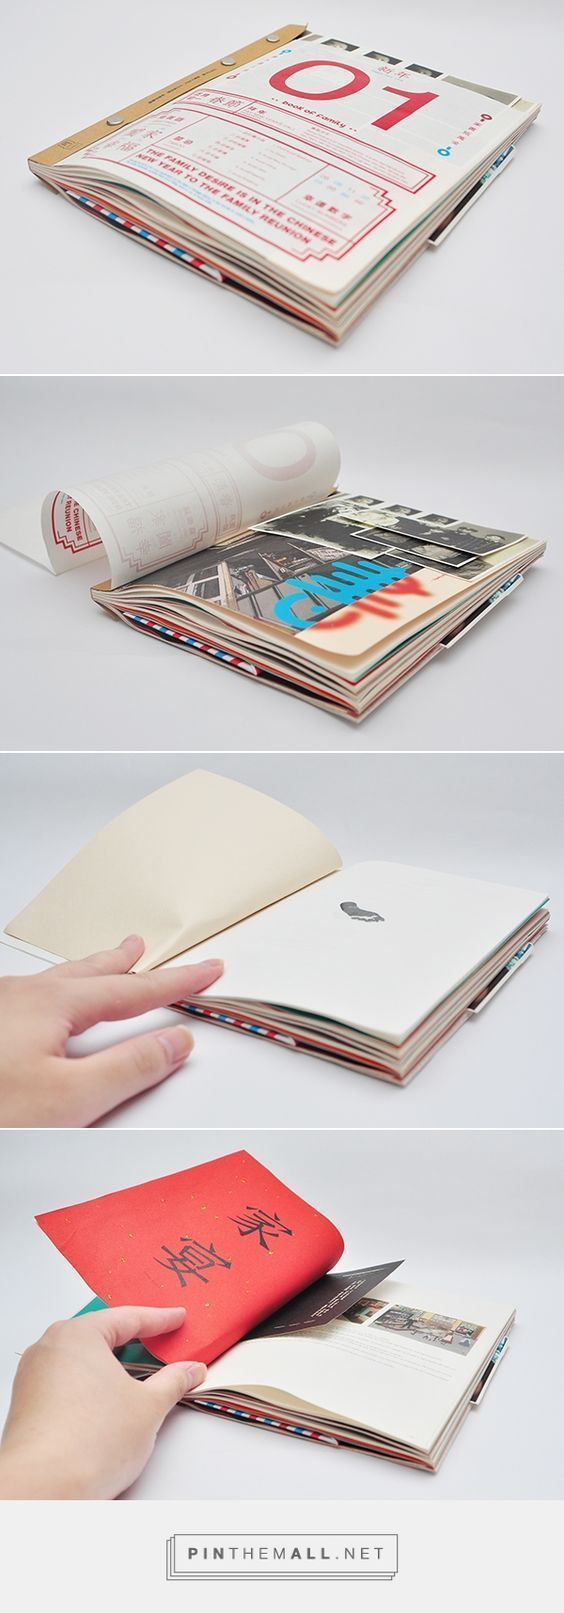 Simple Design Ideas Type Book Binding Design Book Cover Design Booklet Design